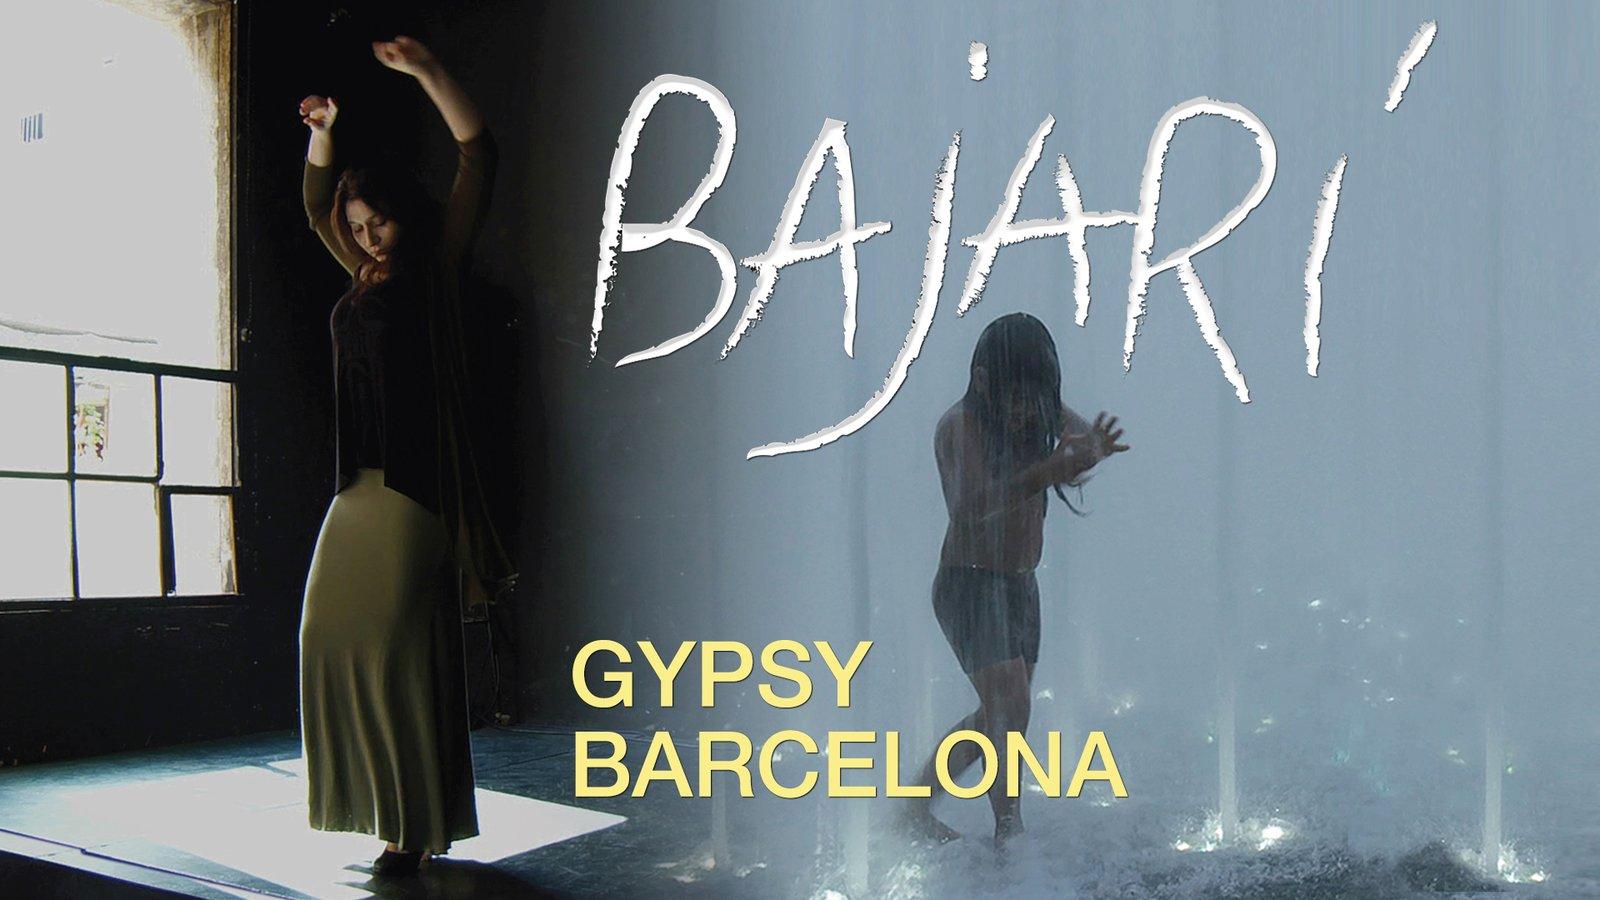 Bajari: Gypsy Barcelona - One Family's Flamenco Legacy